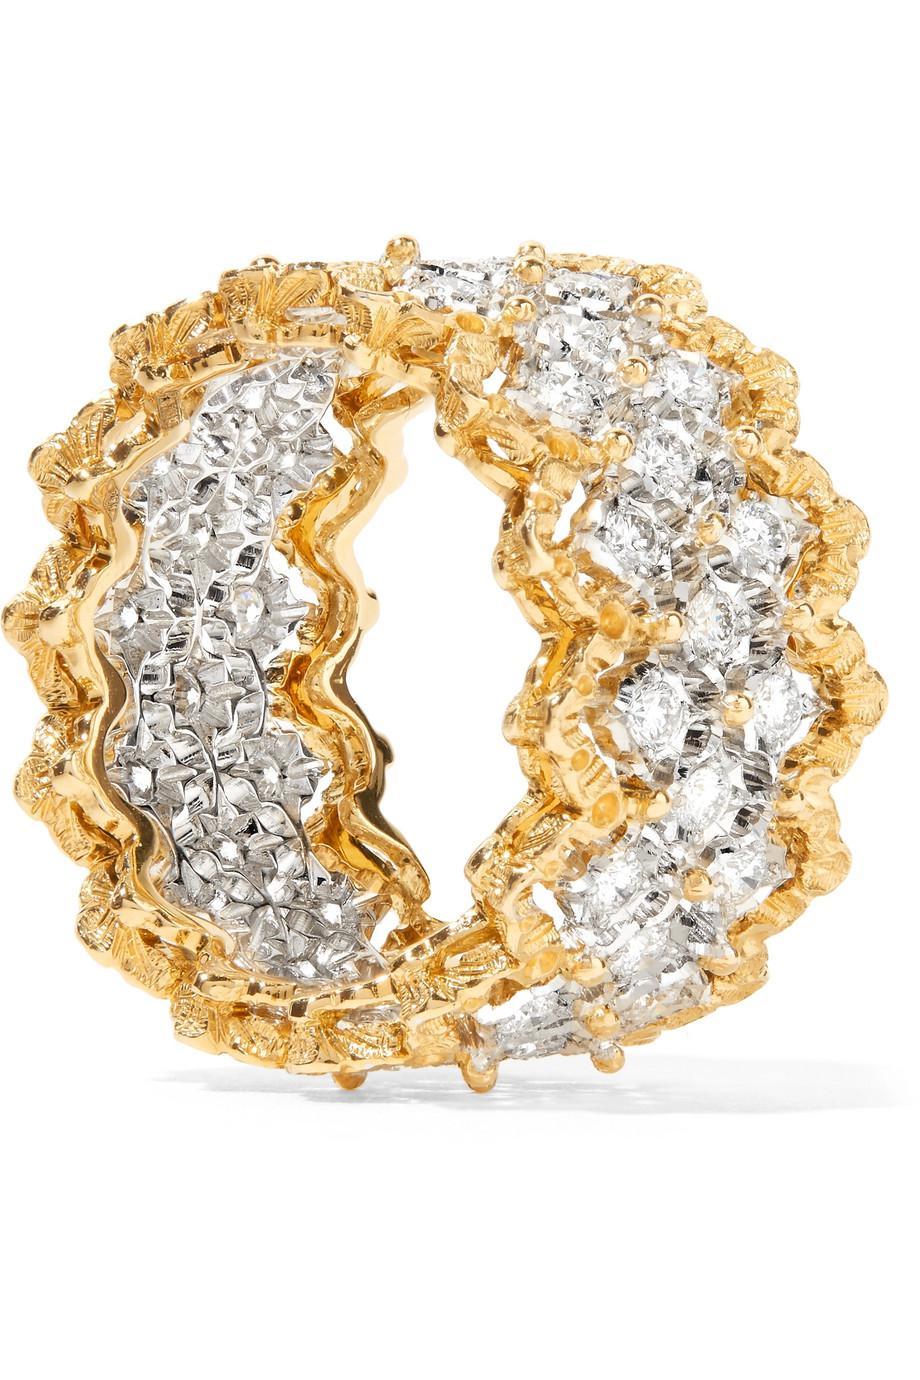 Buccellati Rombi 18-karat Yellow And White Gold Diamond Ring CBXL0